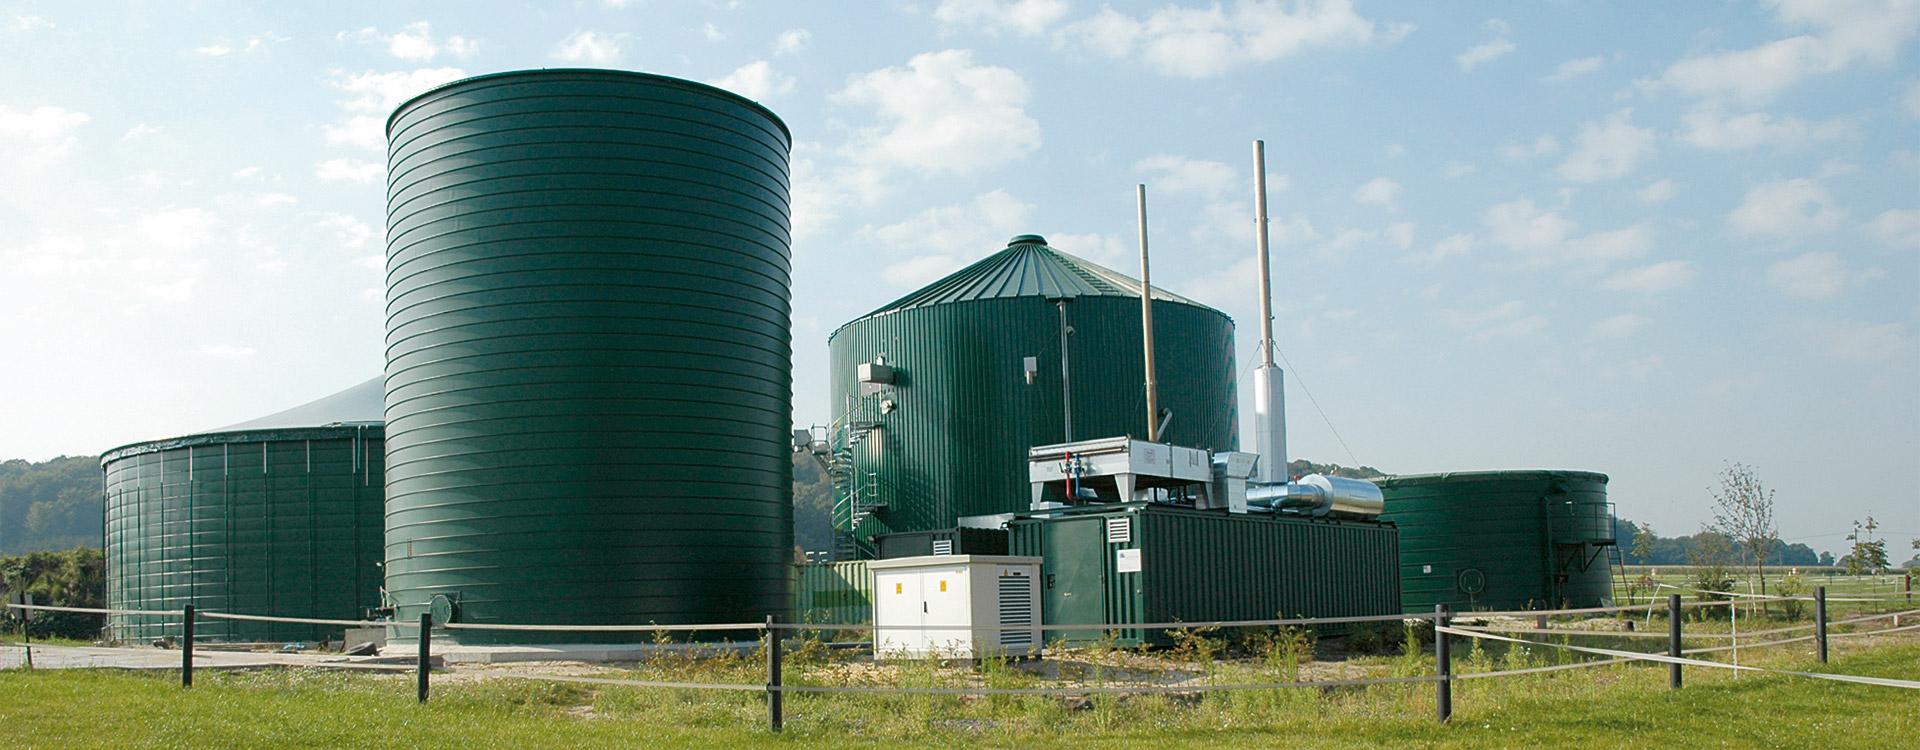 Biogas Plant - Lipp System